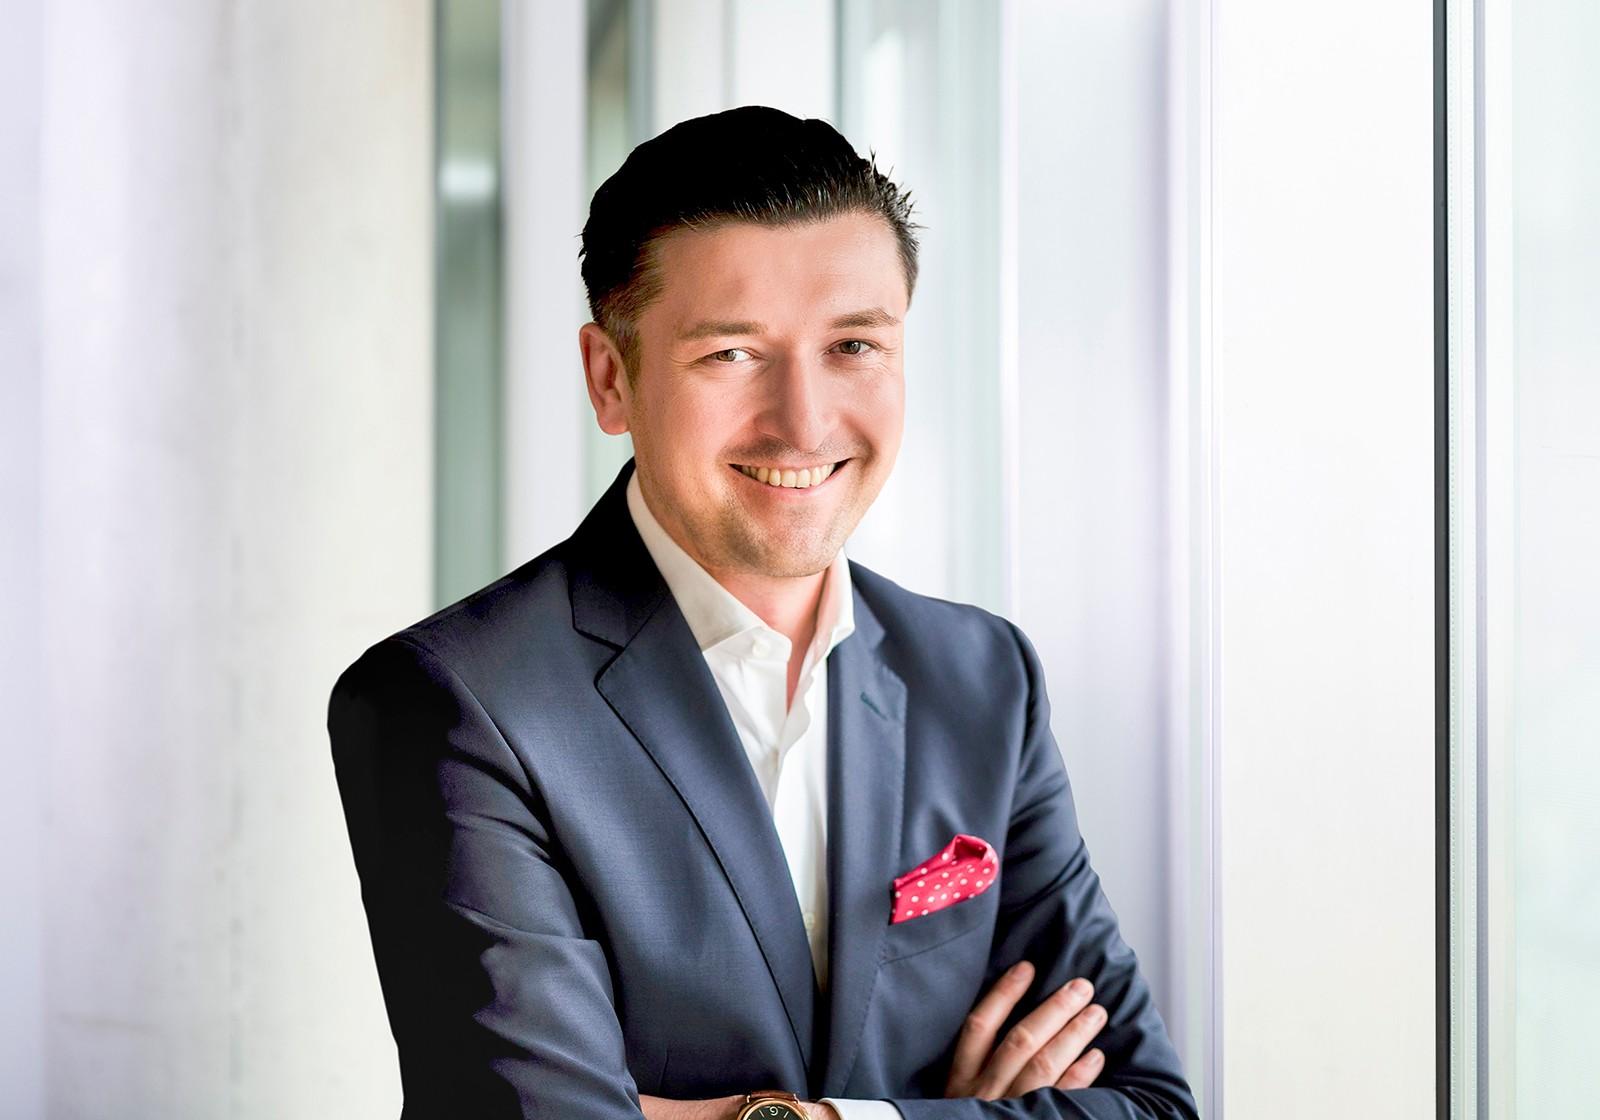 Denis Cupic, Geschäftsführer redserve Zagreb<br><span class='image_copyright'>Reflexion/Damian Fiket</span><br>